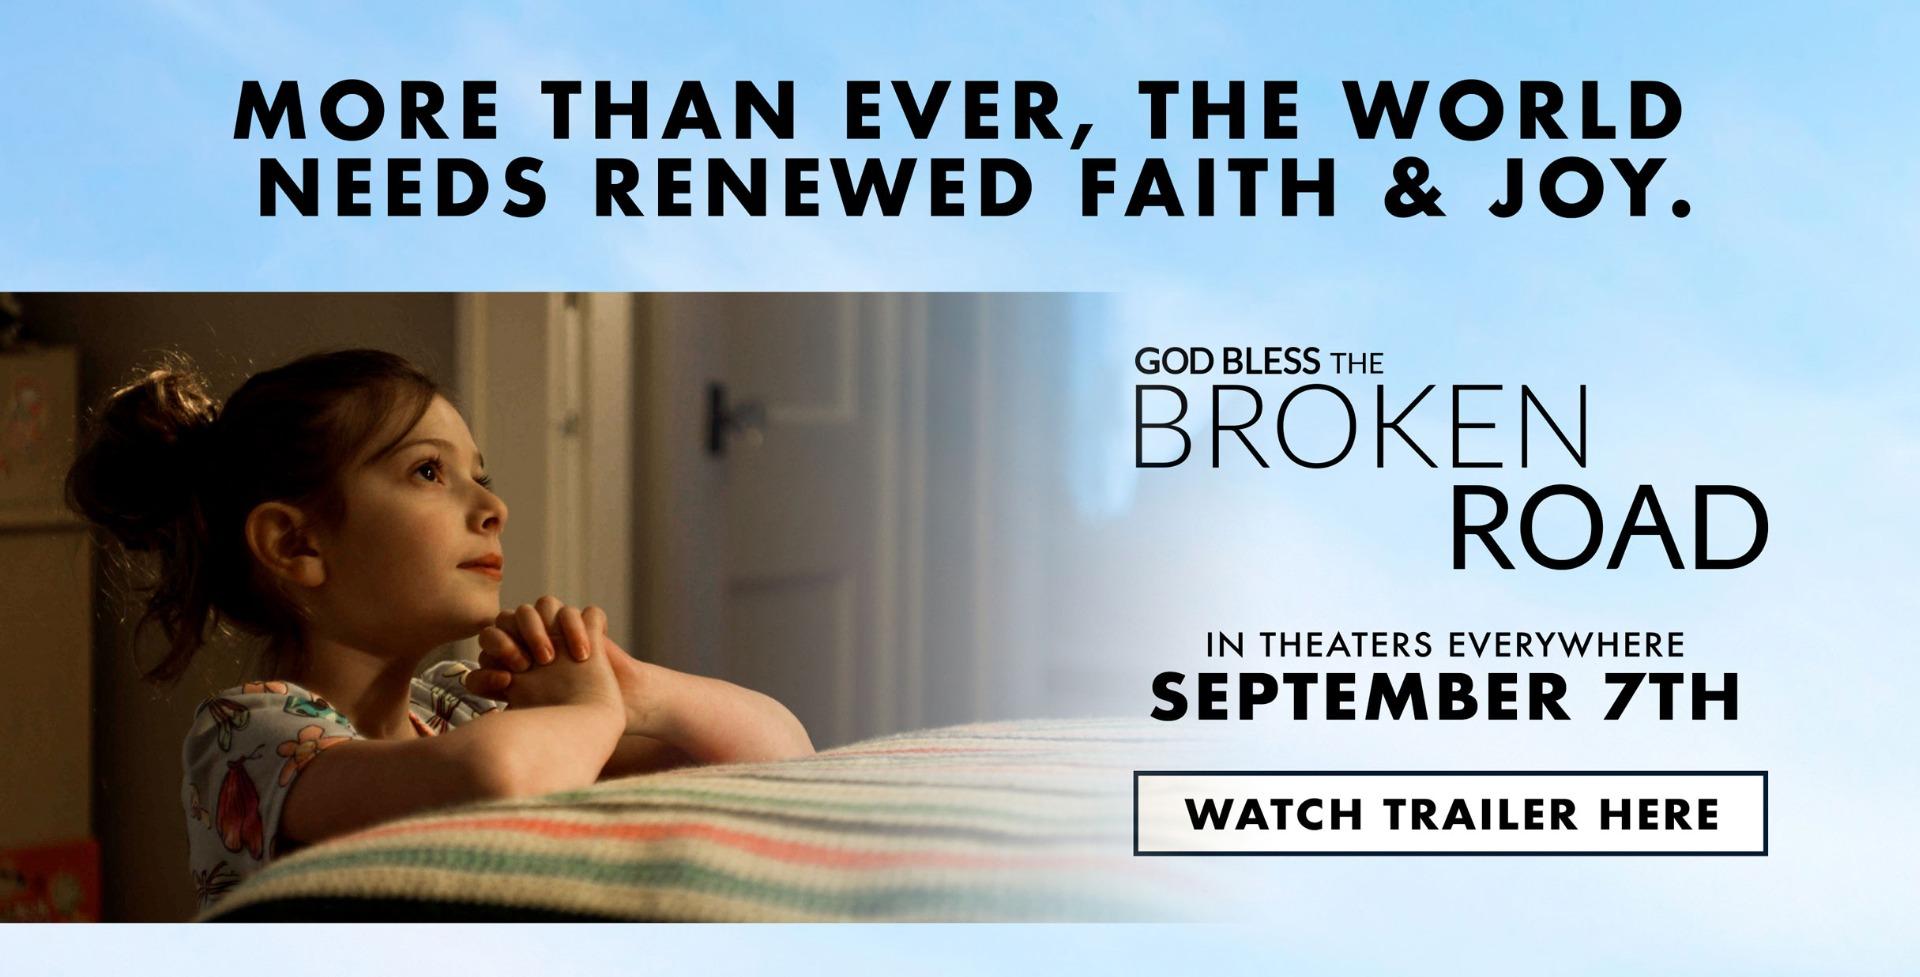 More than ever, the world needs renewed faith & joy